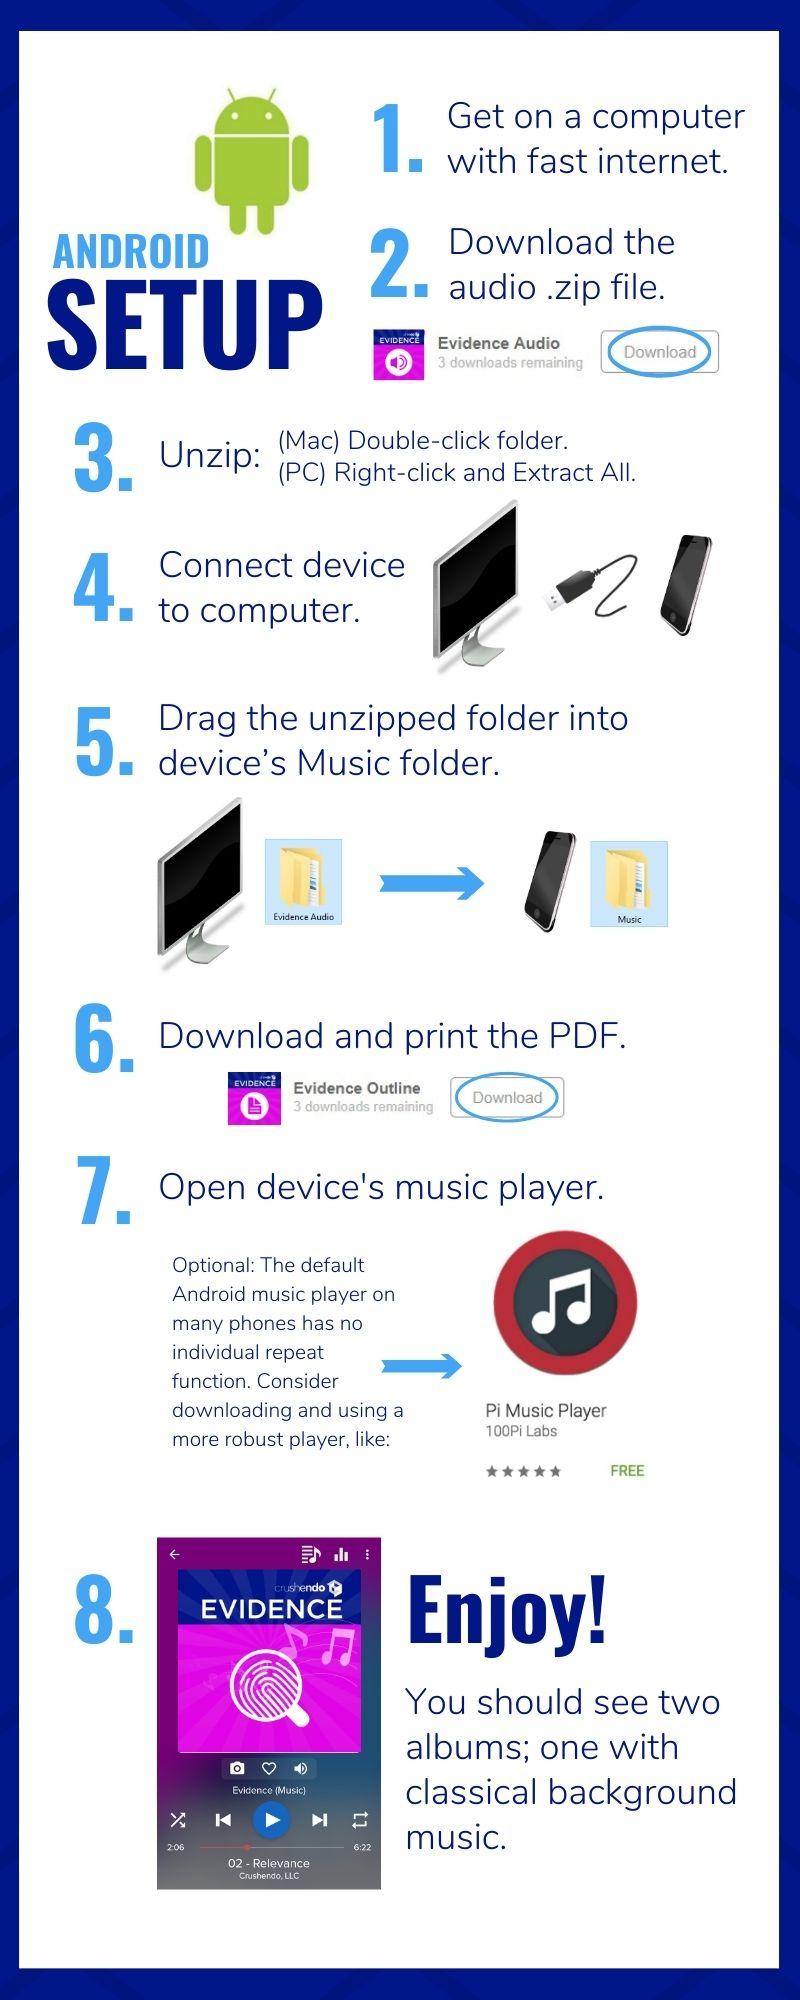 Crushendo Android Download Setup